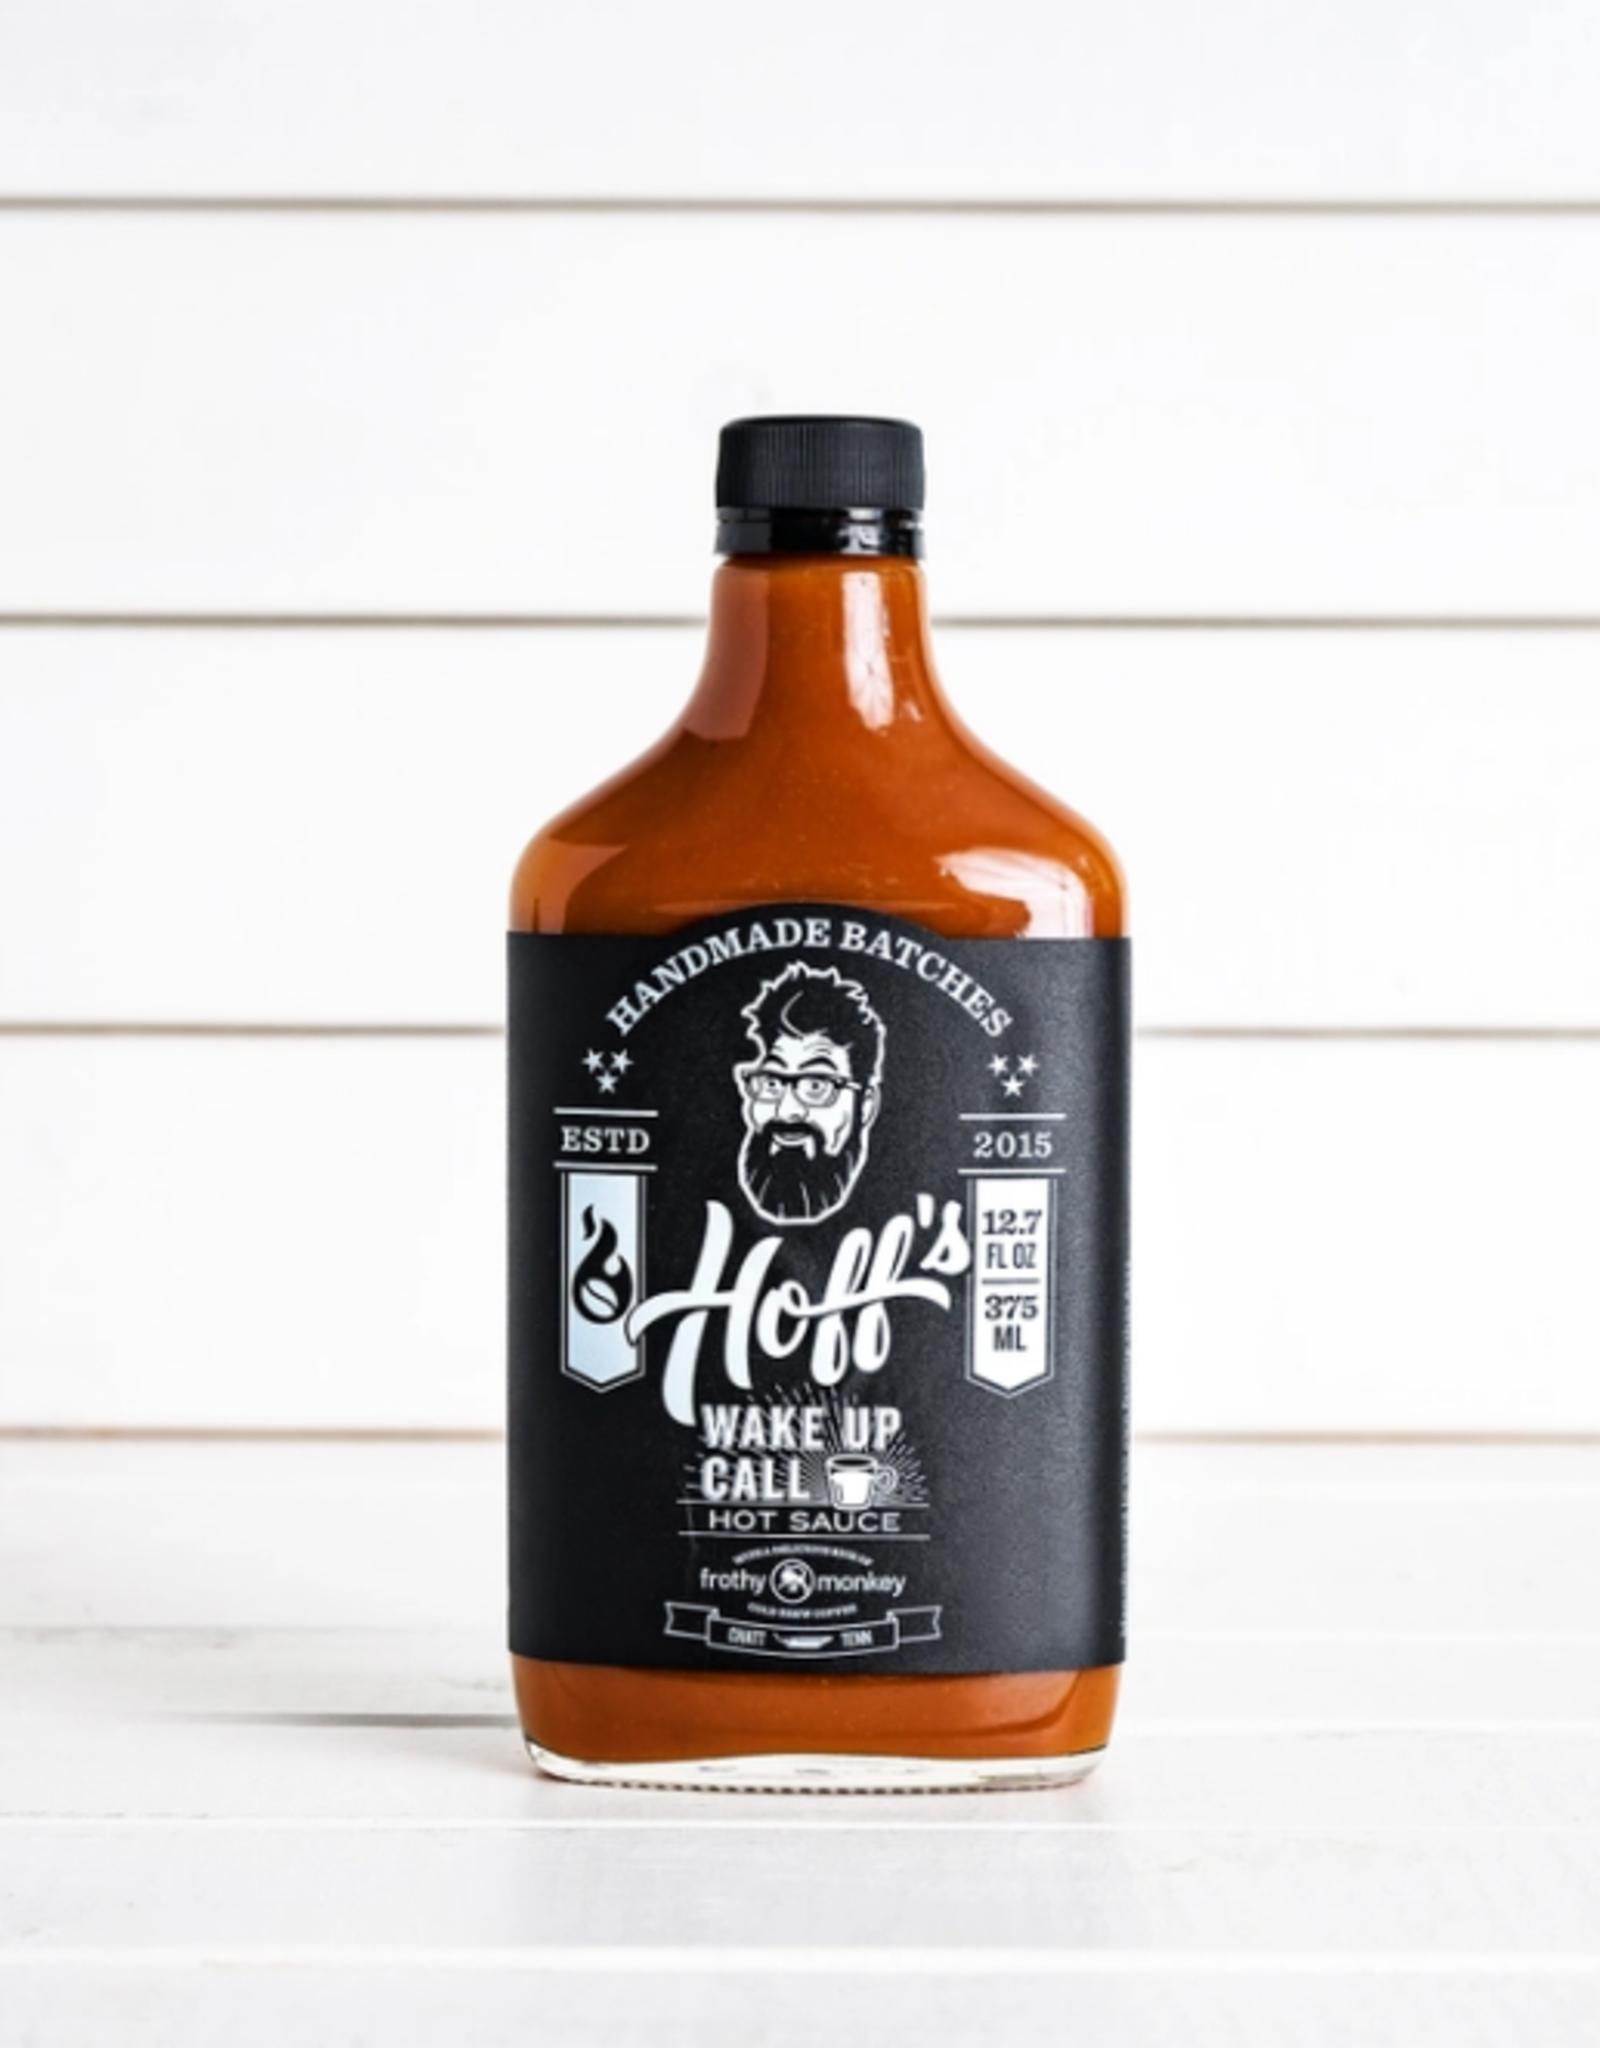 Hoff & Pepper Wake Up Call, Hoff's Sweet/Spicy Hot Sauce w/ Coffee 12oz